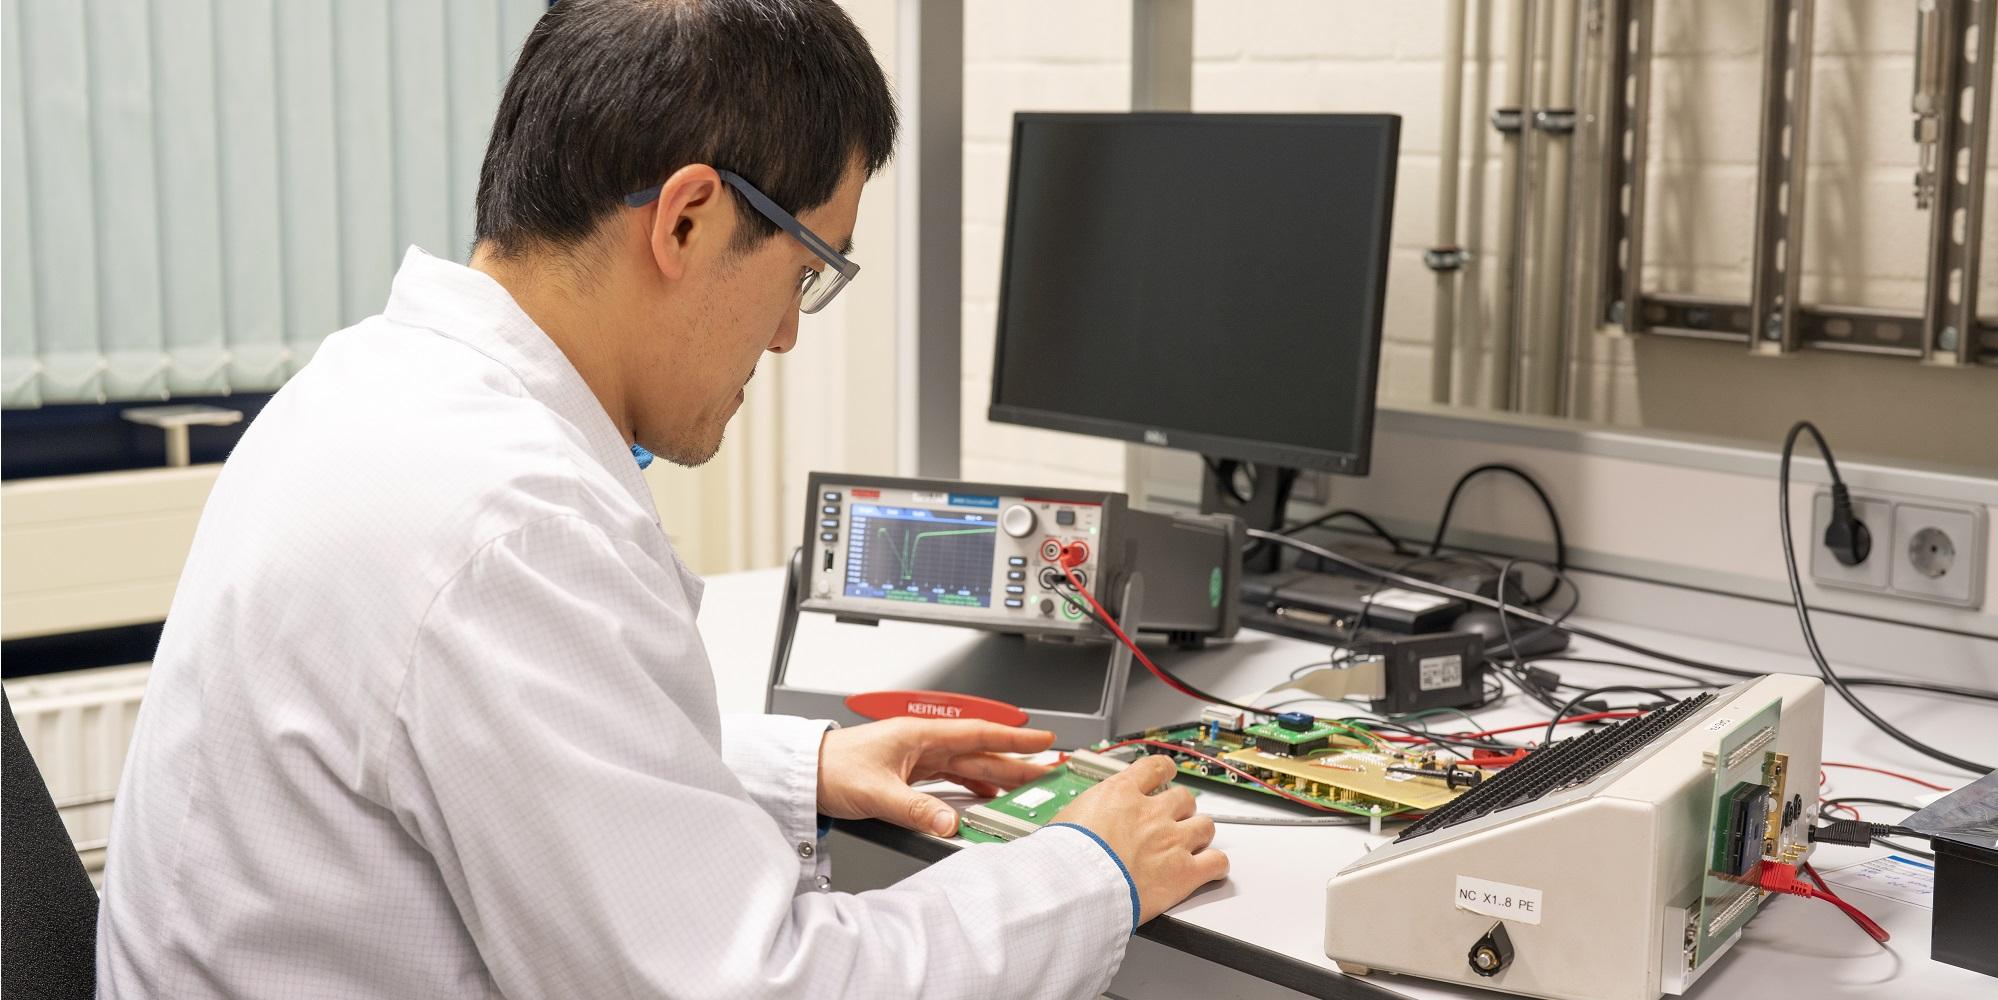 Design of analog electronics - analog electronics 1 - High Tech Institute